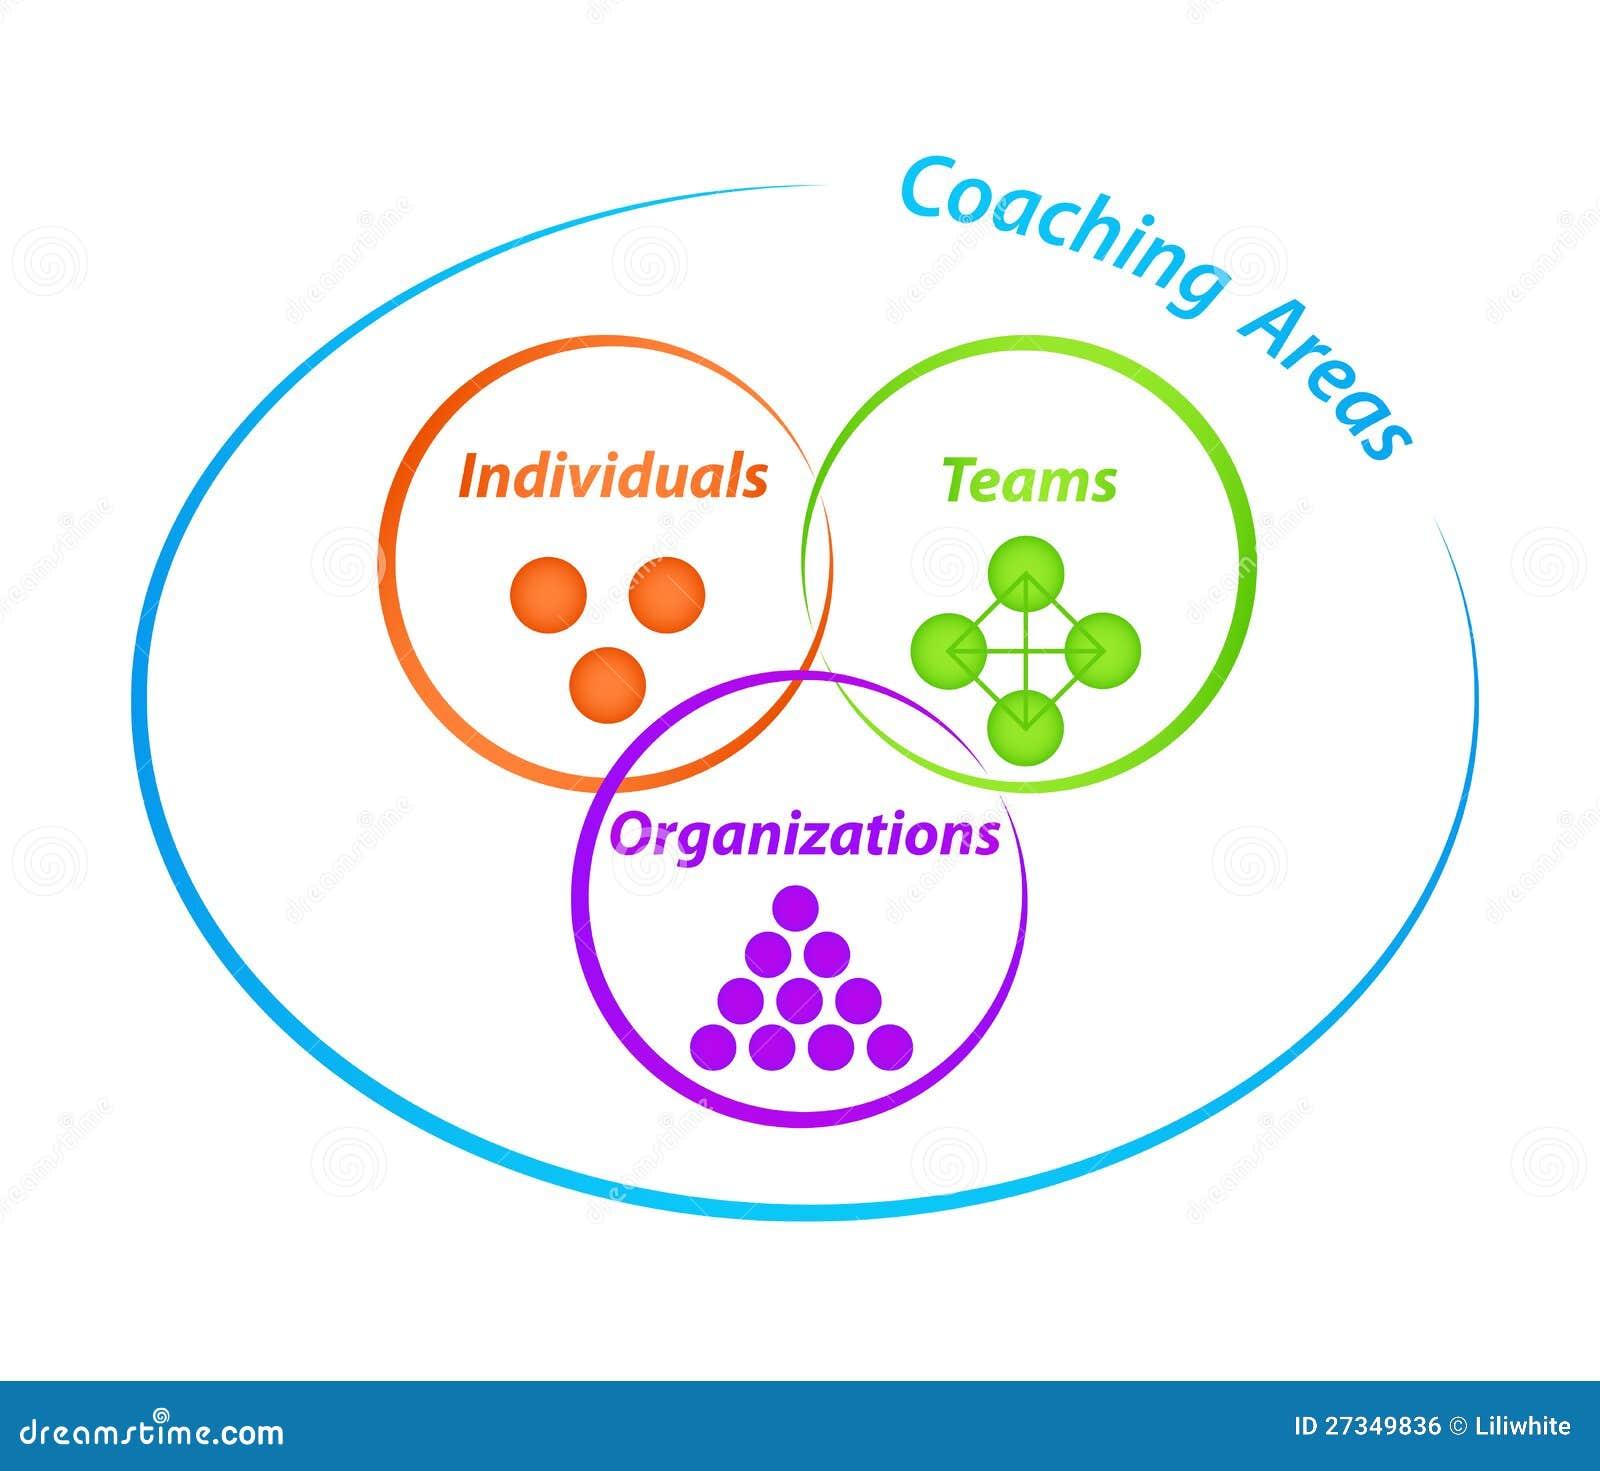 Coaching Areas Diagram